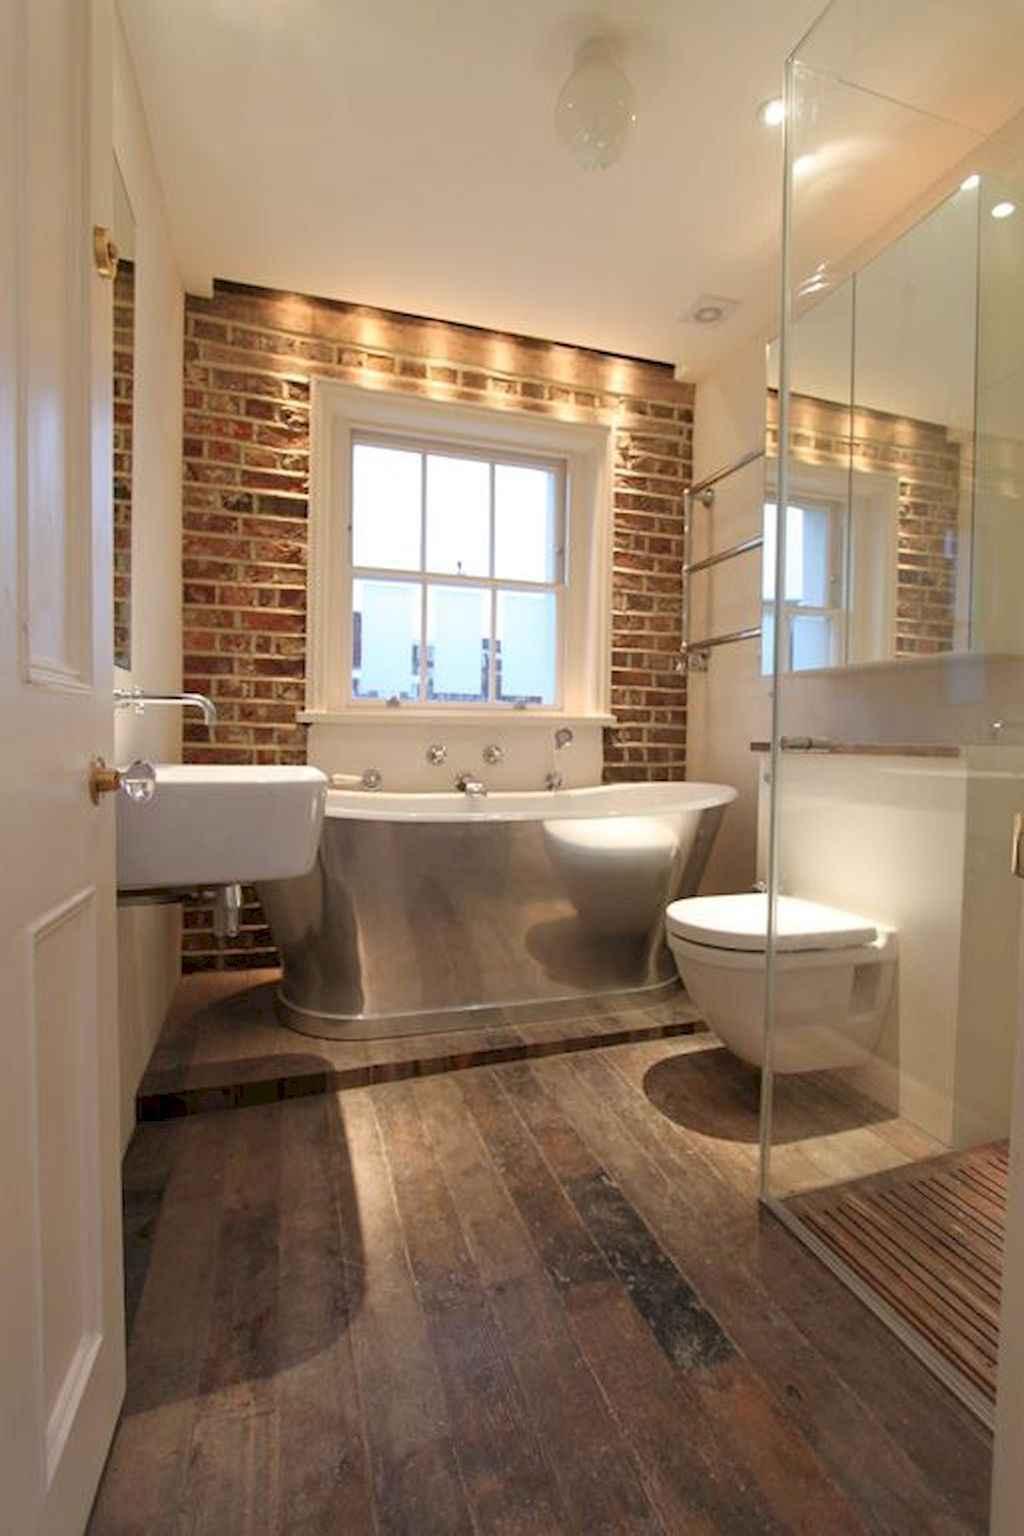 111 Brilliant Small Bathroom Remodel Ideas On A Budget (64)